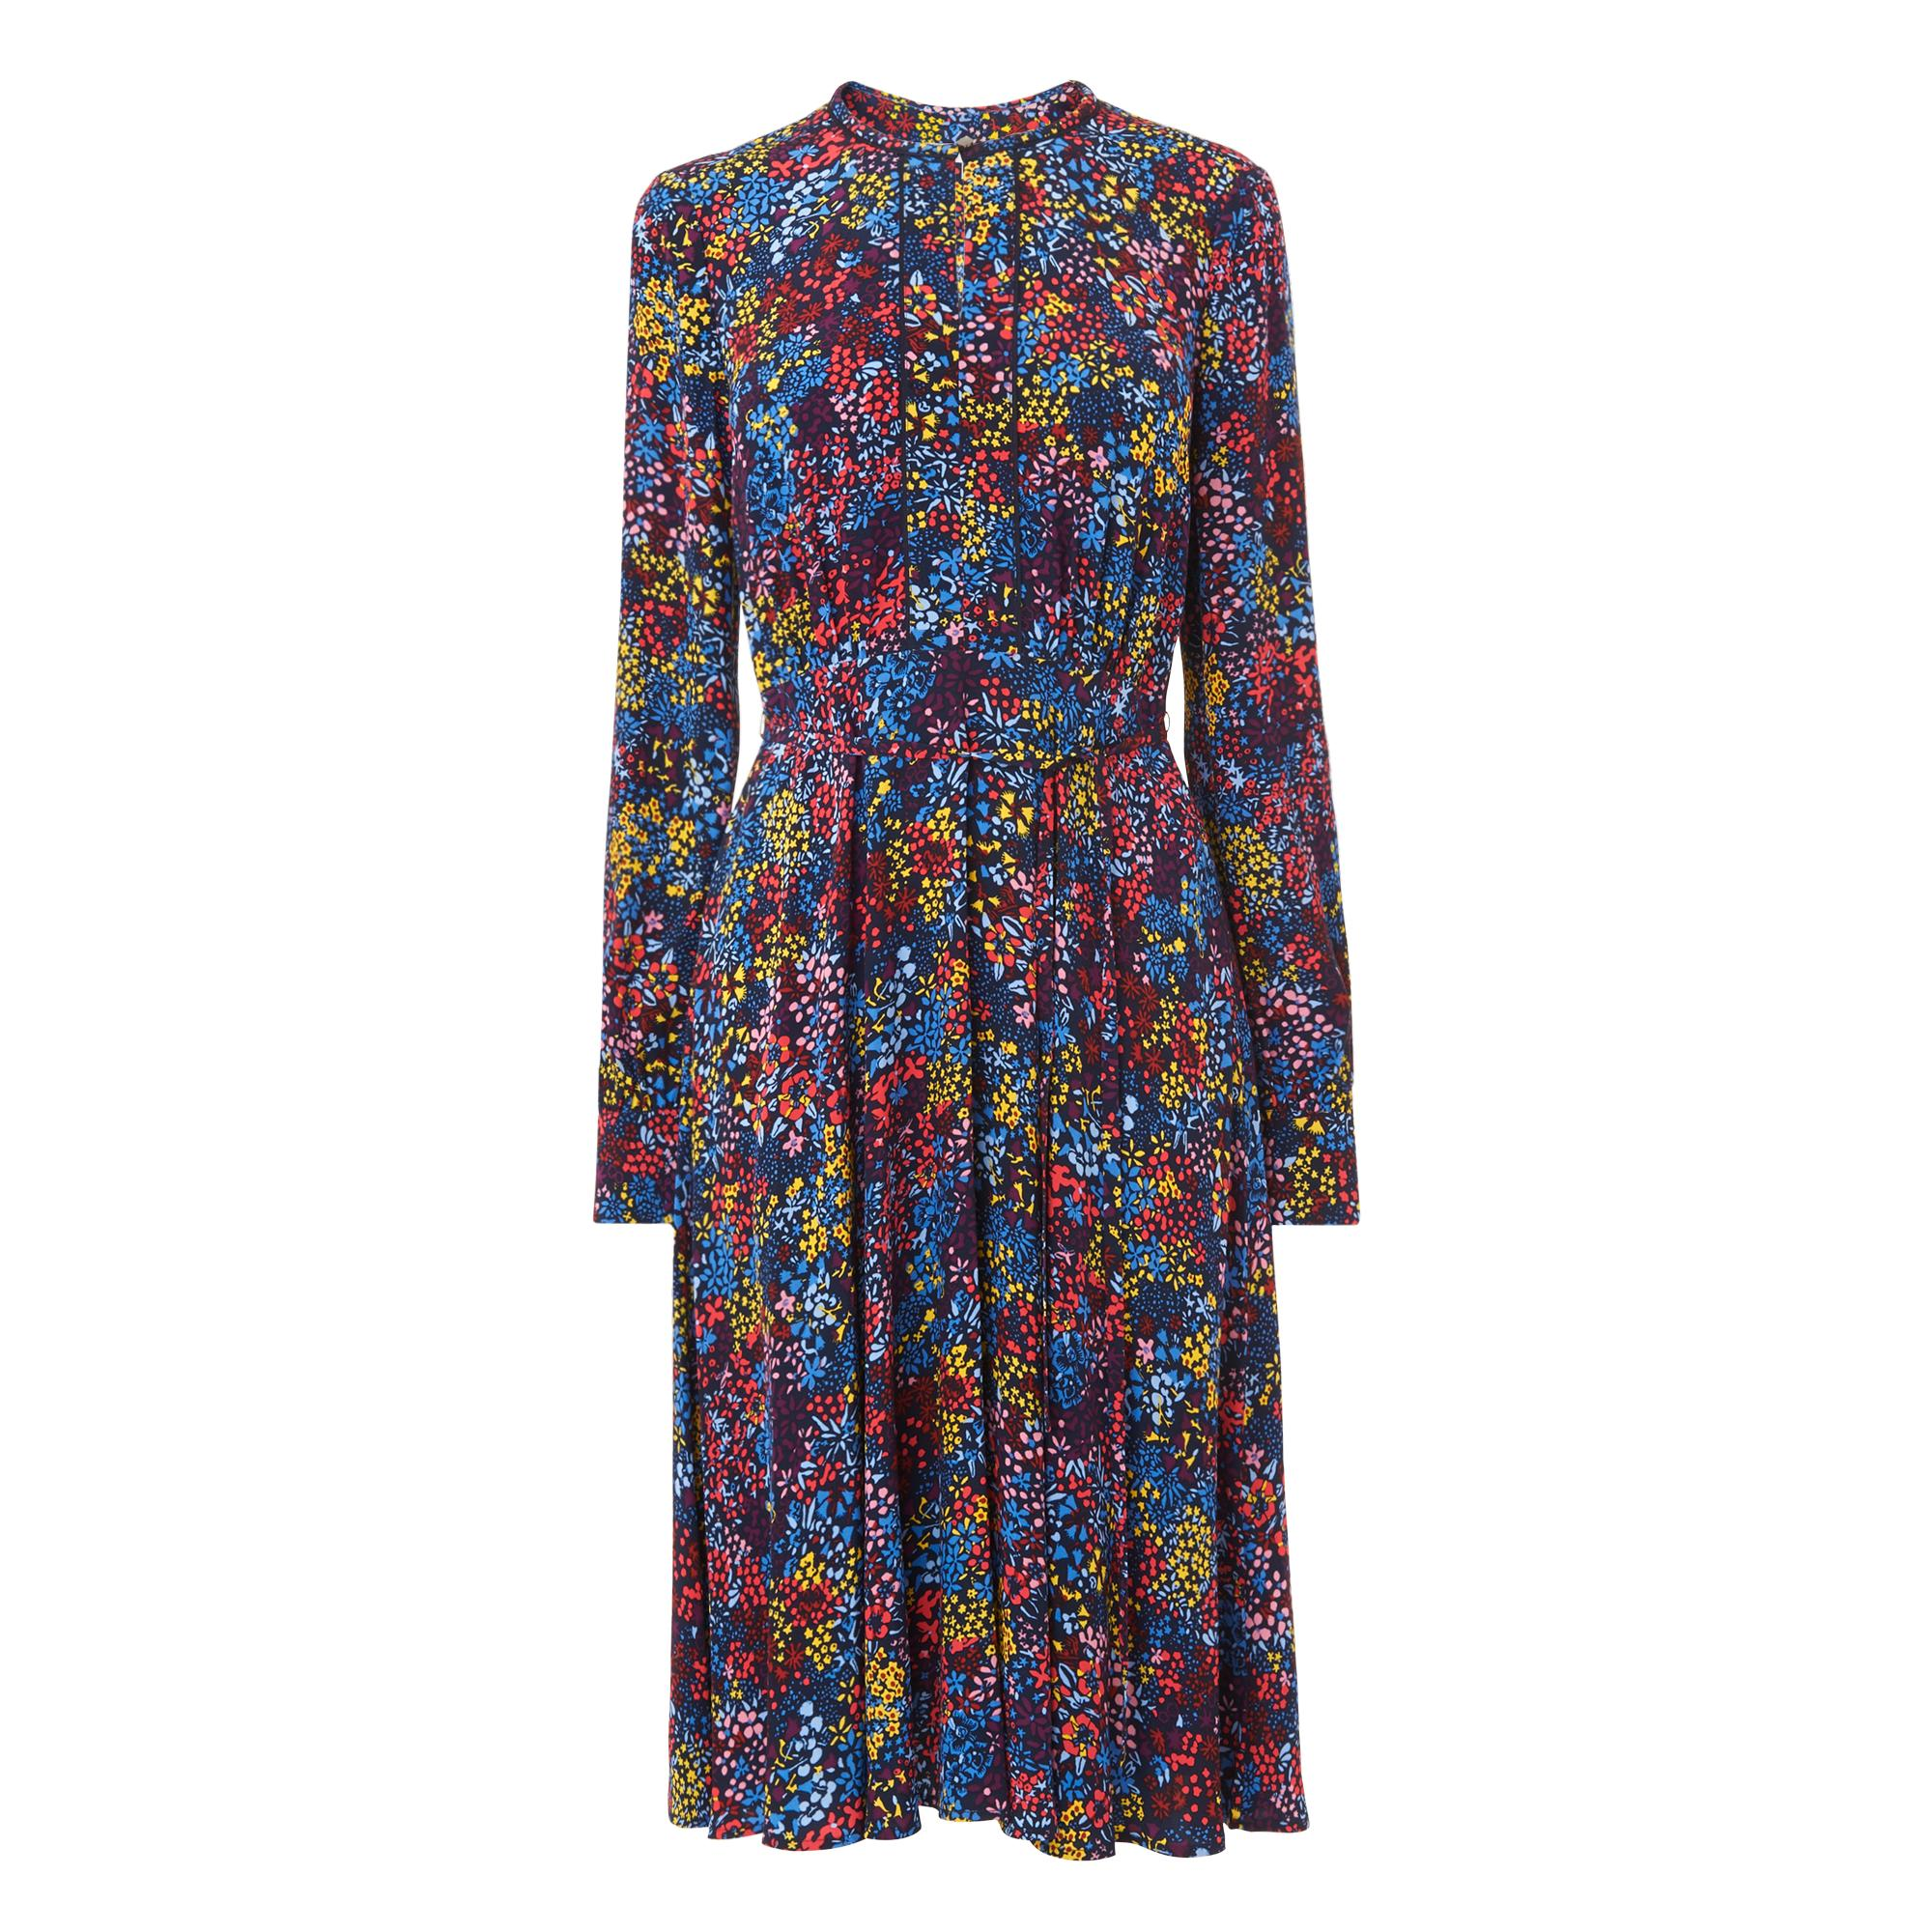 Letisa Floral Print Dress